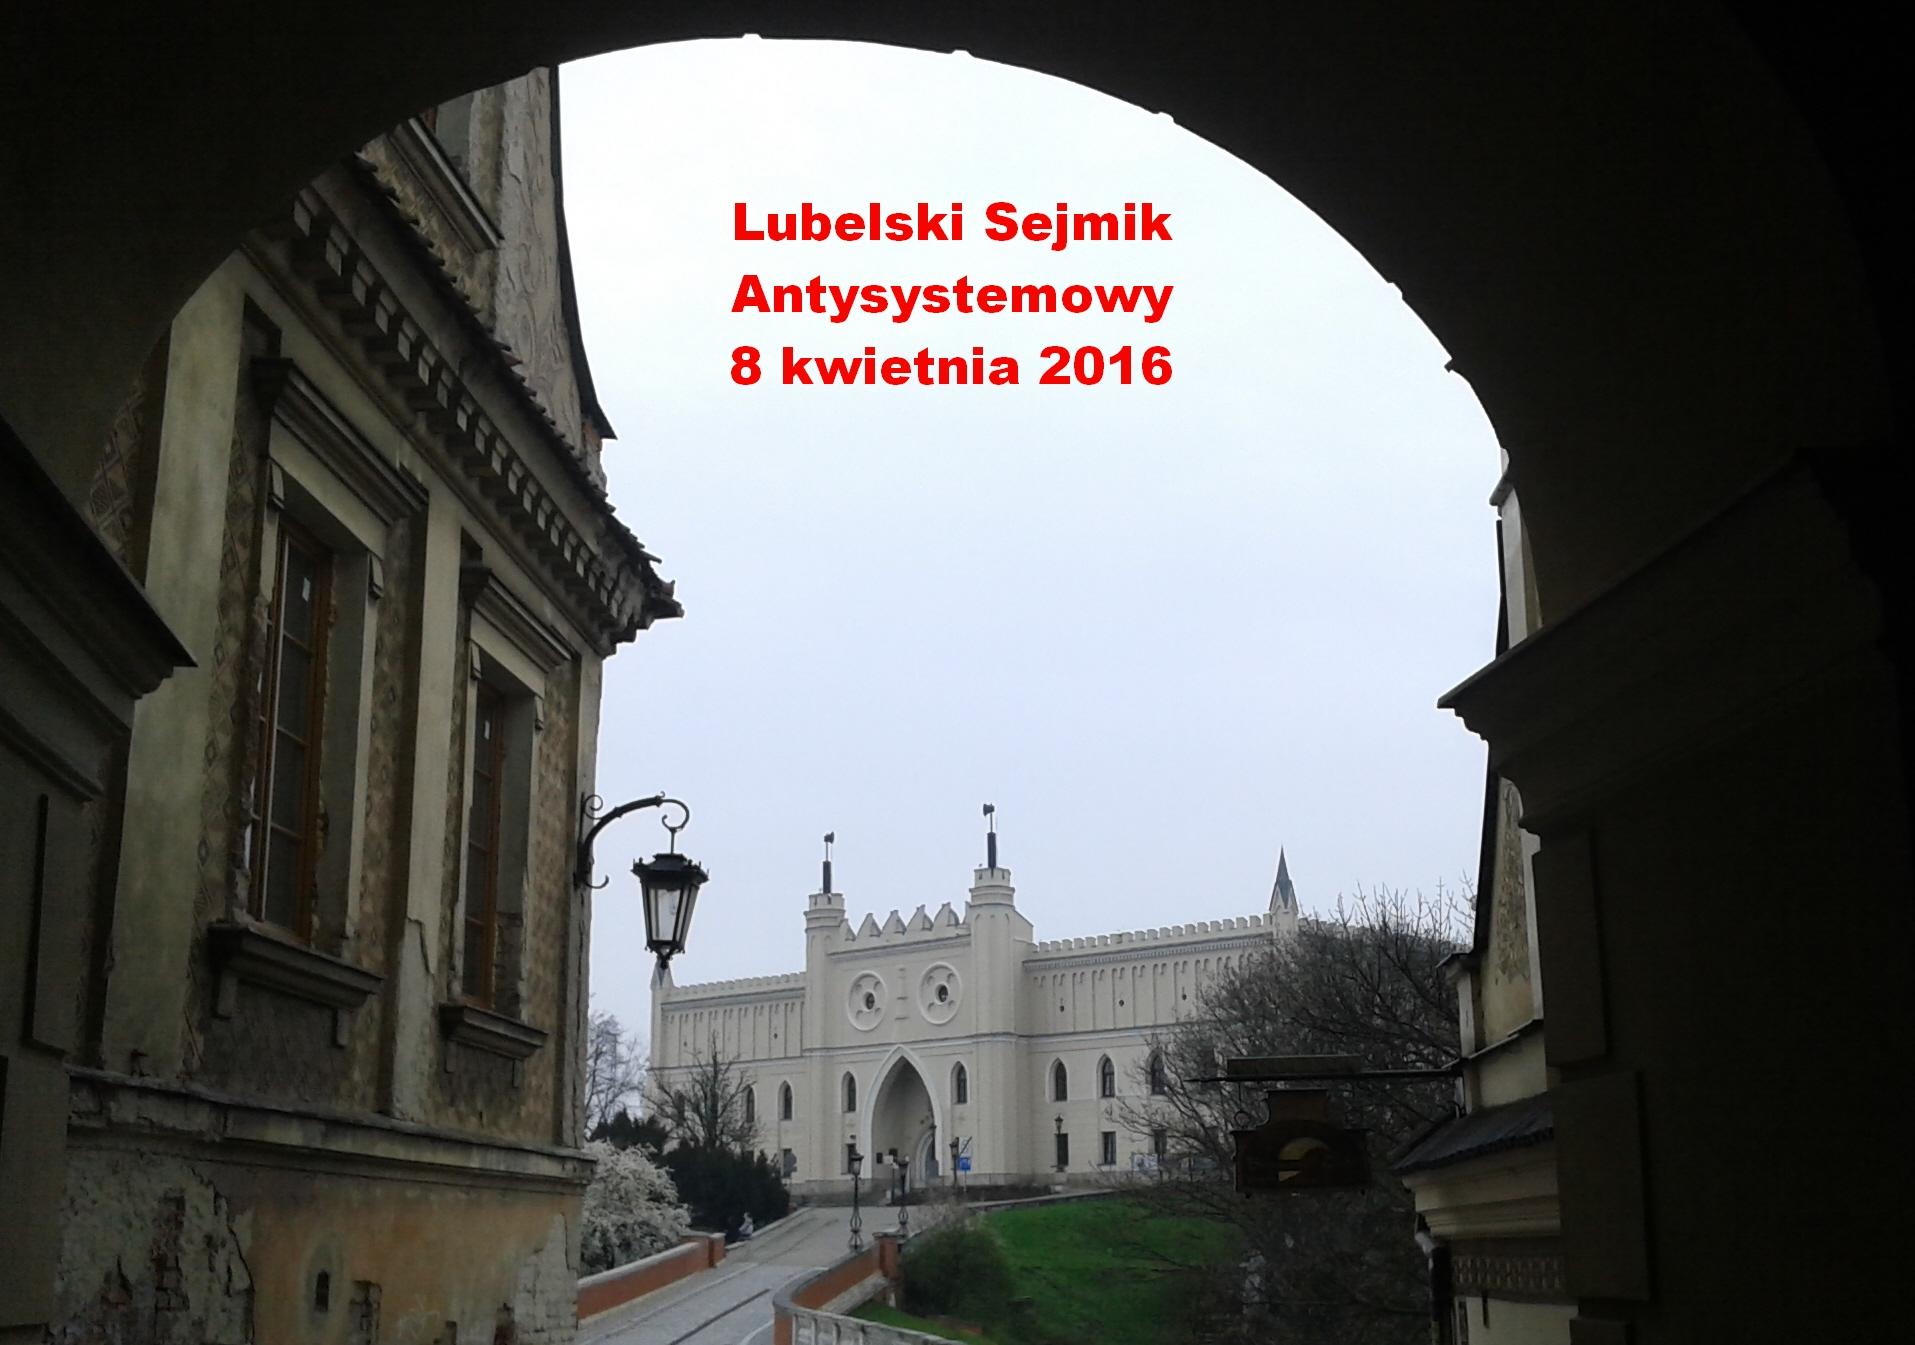 Lubelski Sejmik Antysystemowy